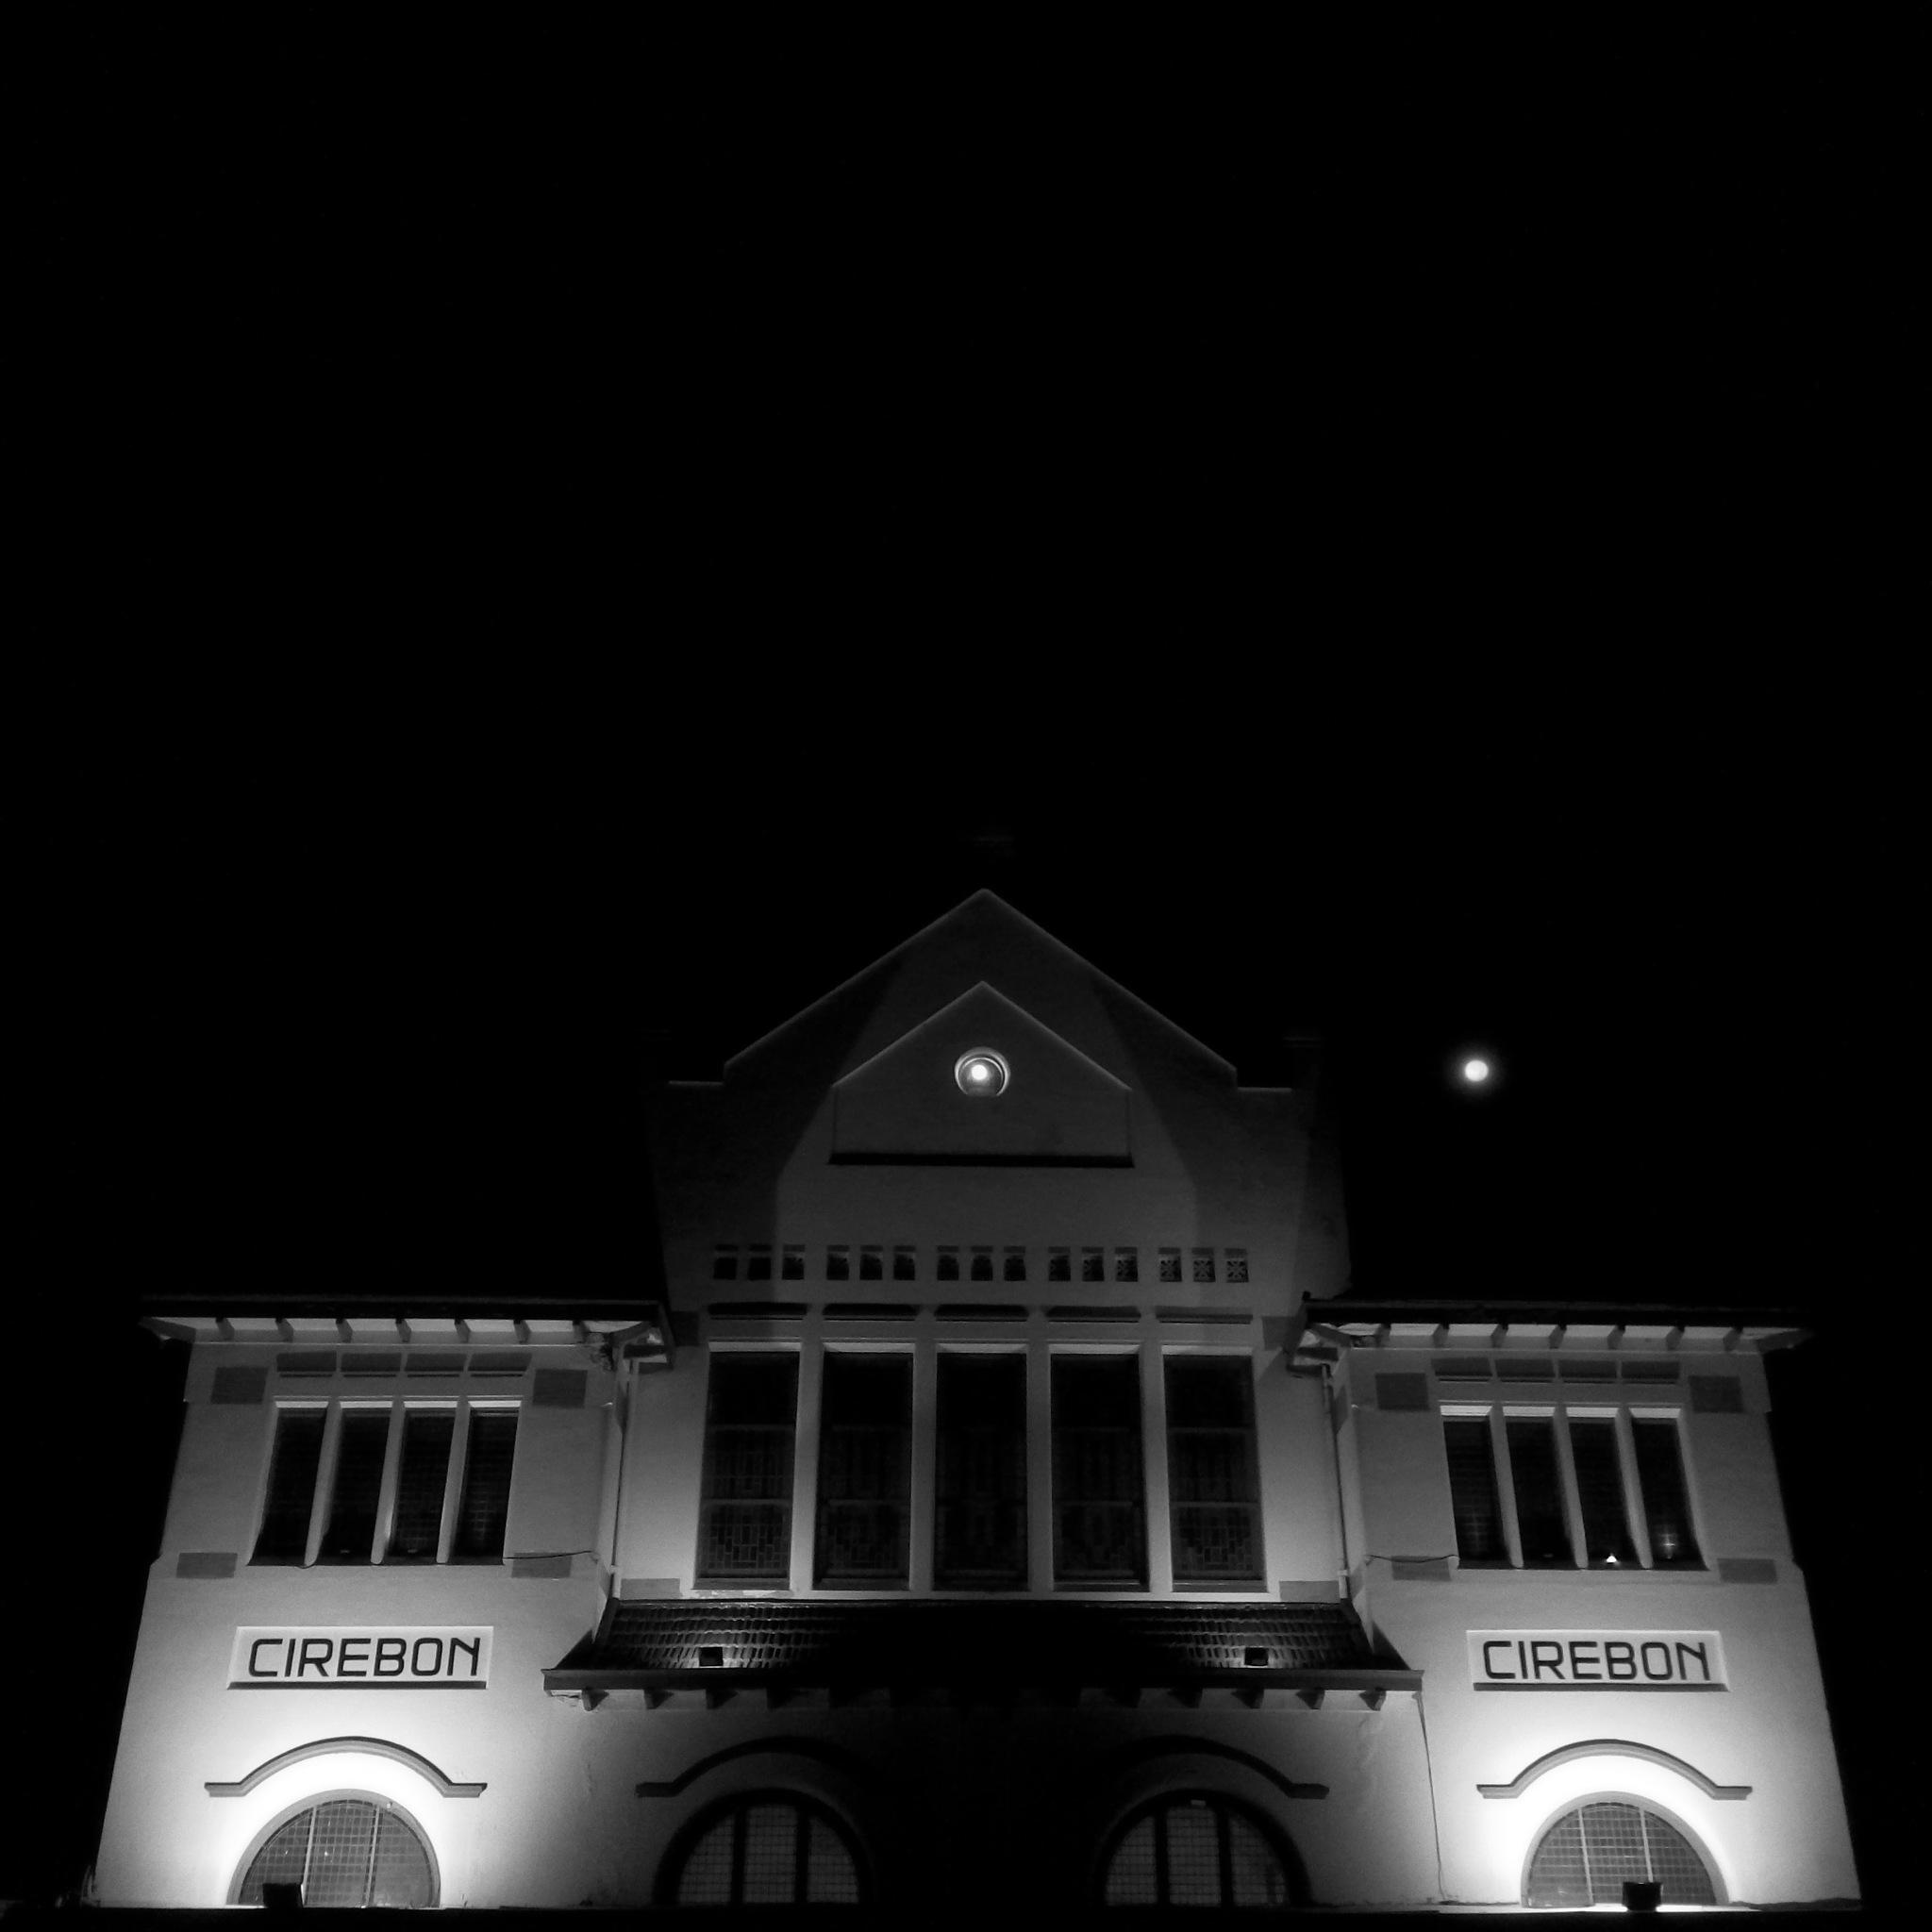 Cirebon train station  by Rizky Arief Imanullah